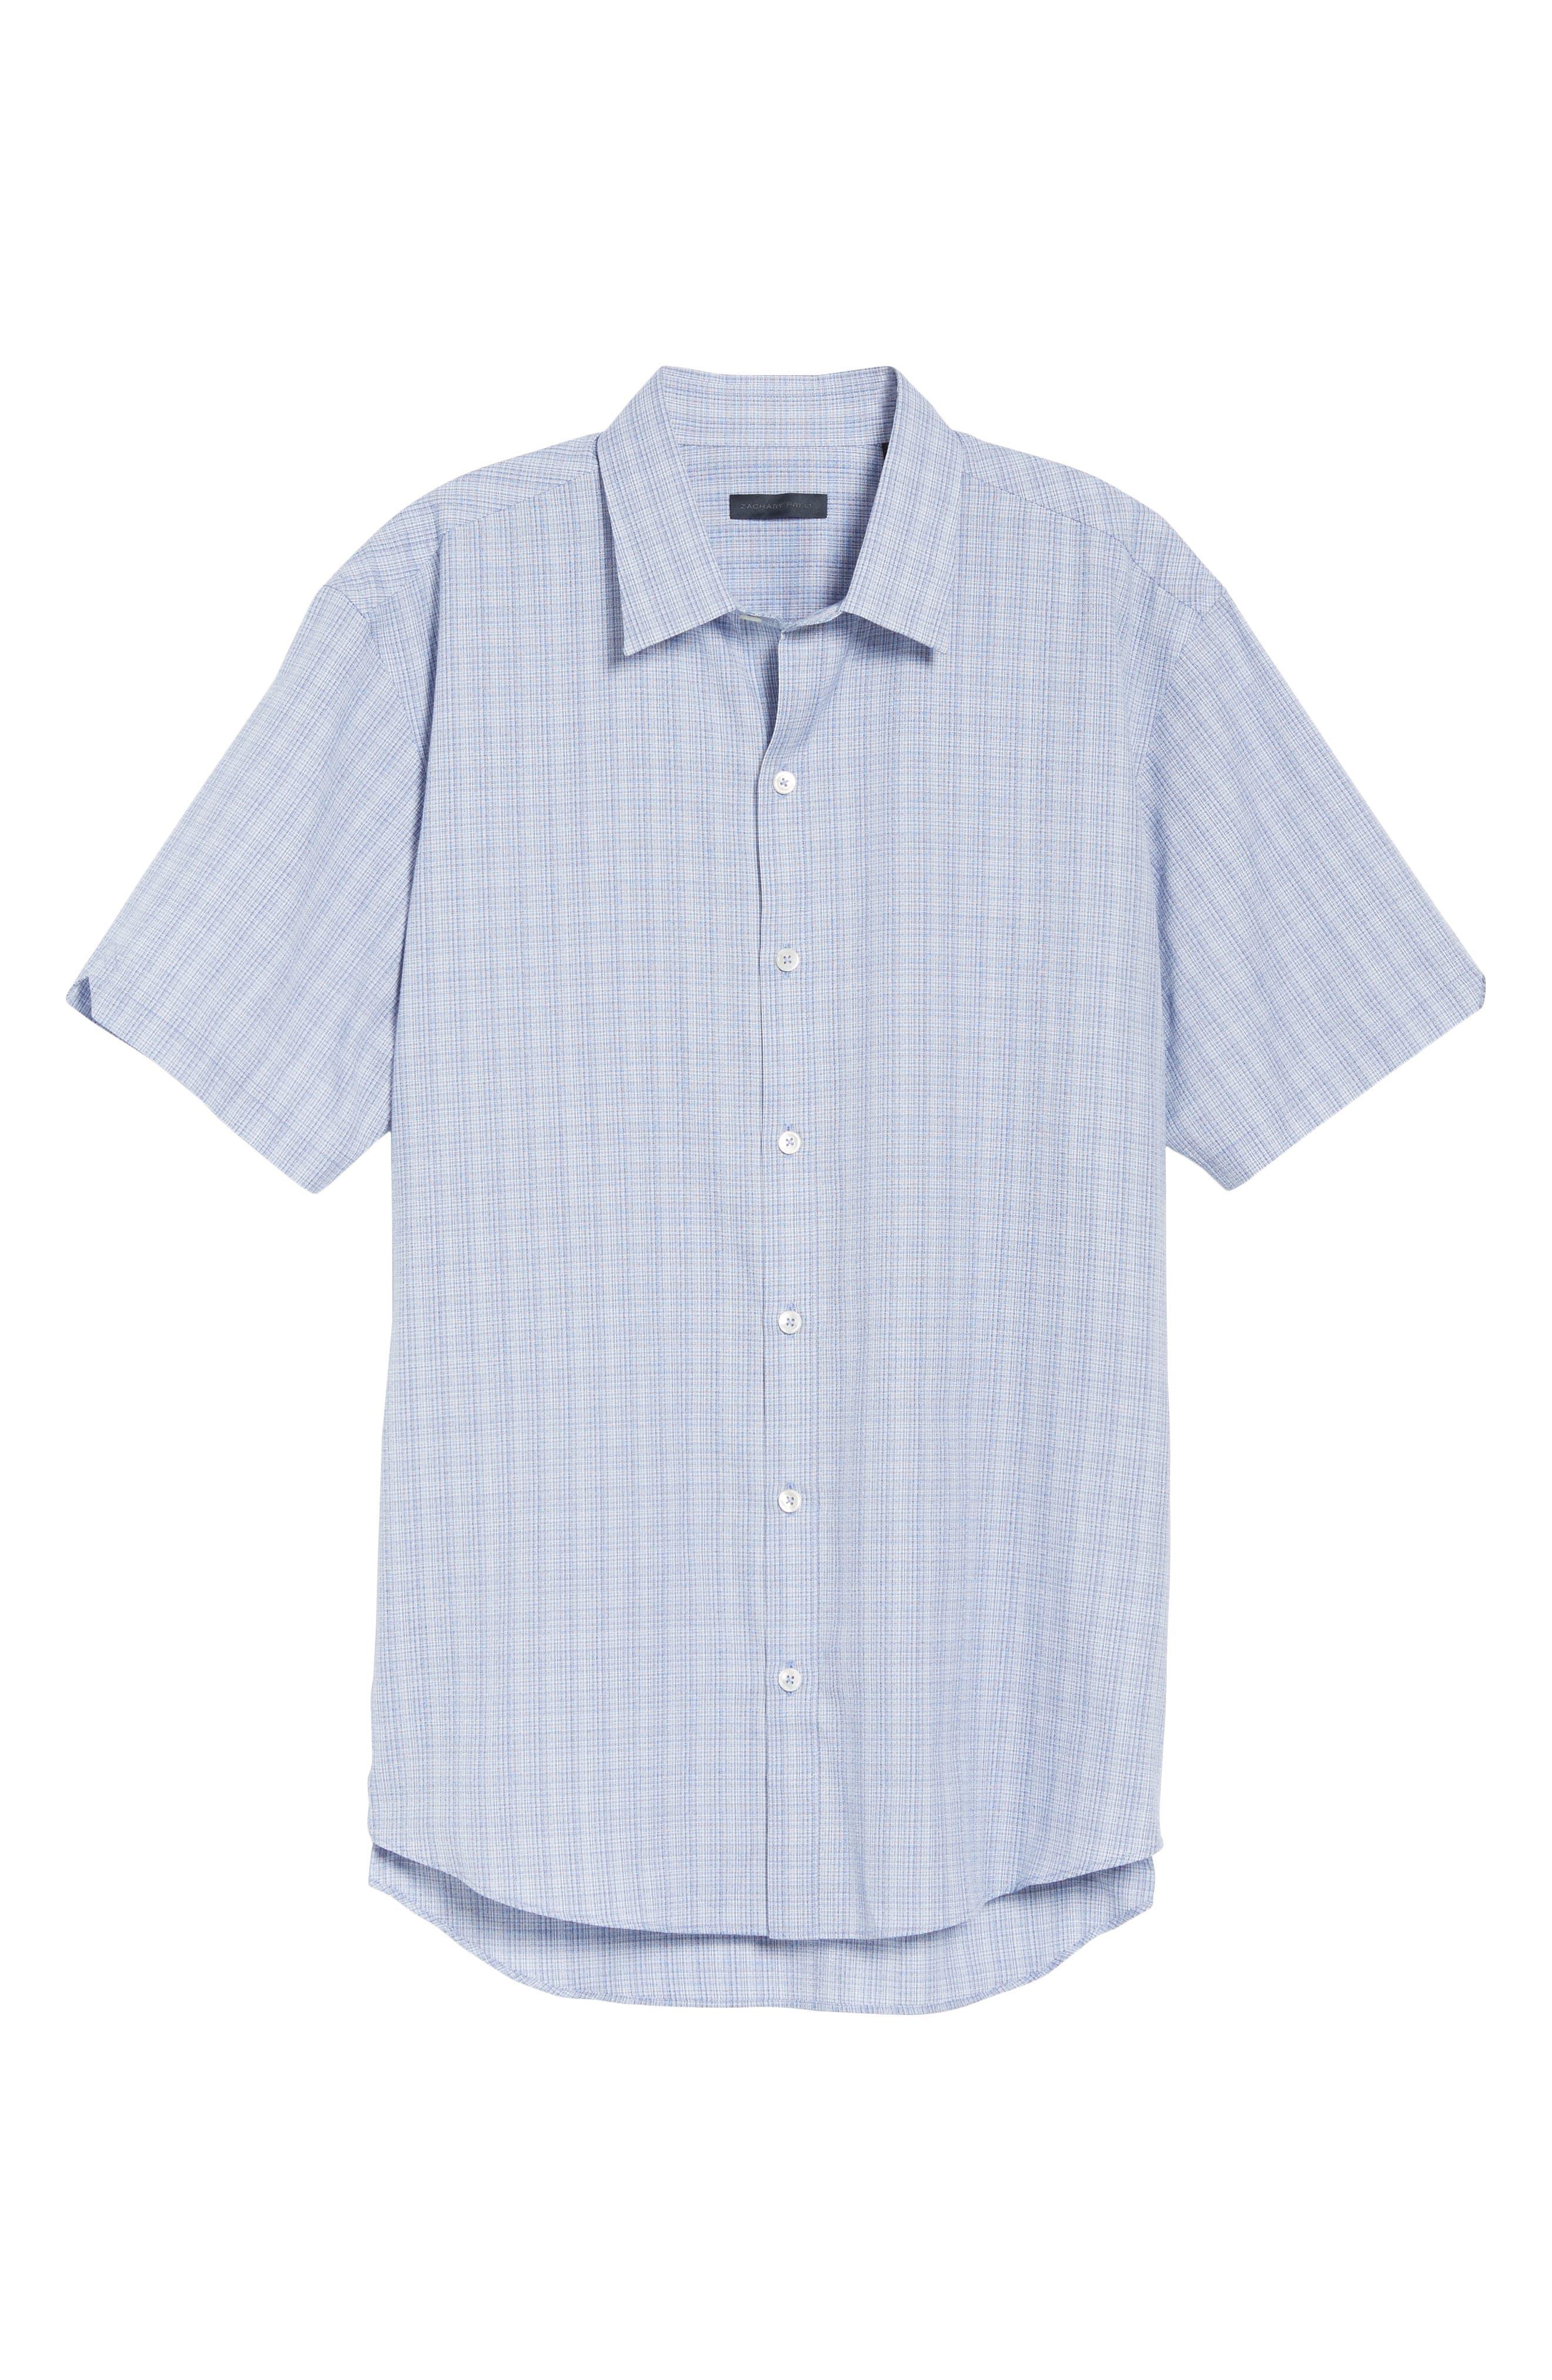 Zimmerman Check Sport Shirt,                             Alternate thumbnail 6, color,                             400